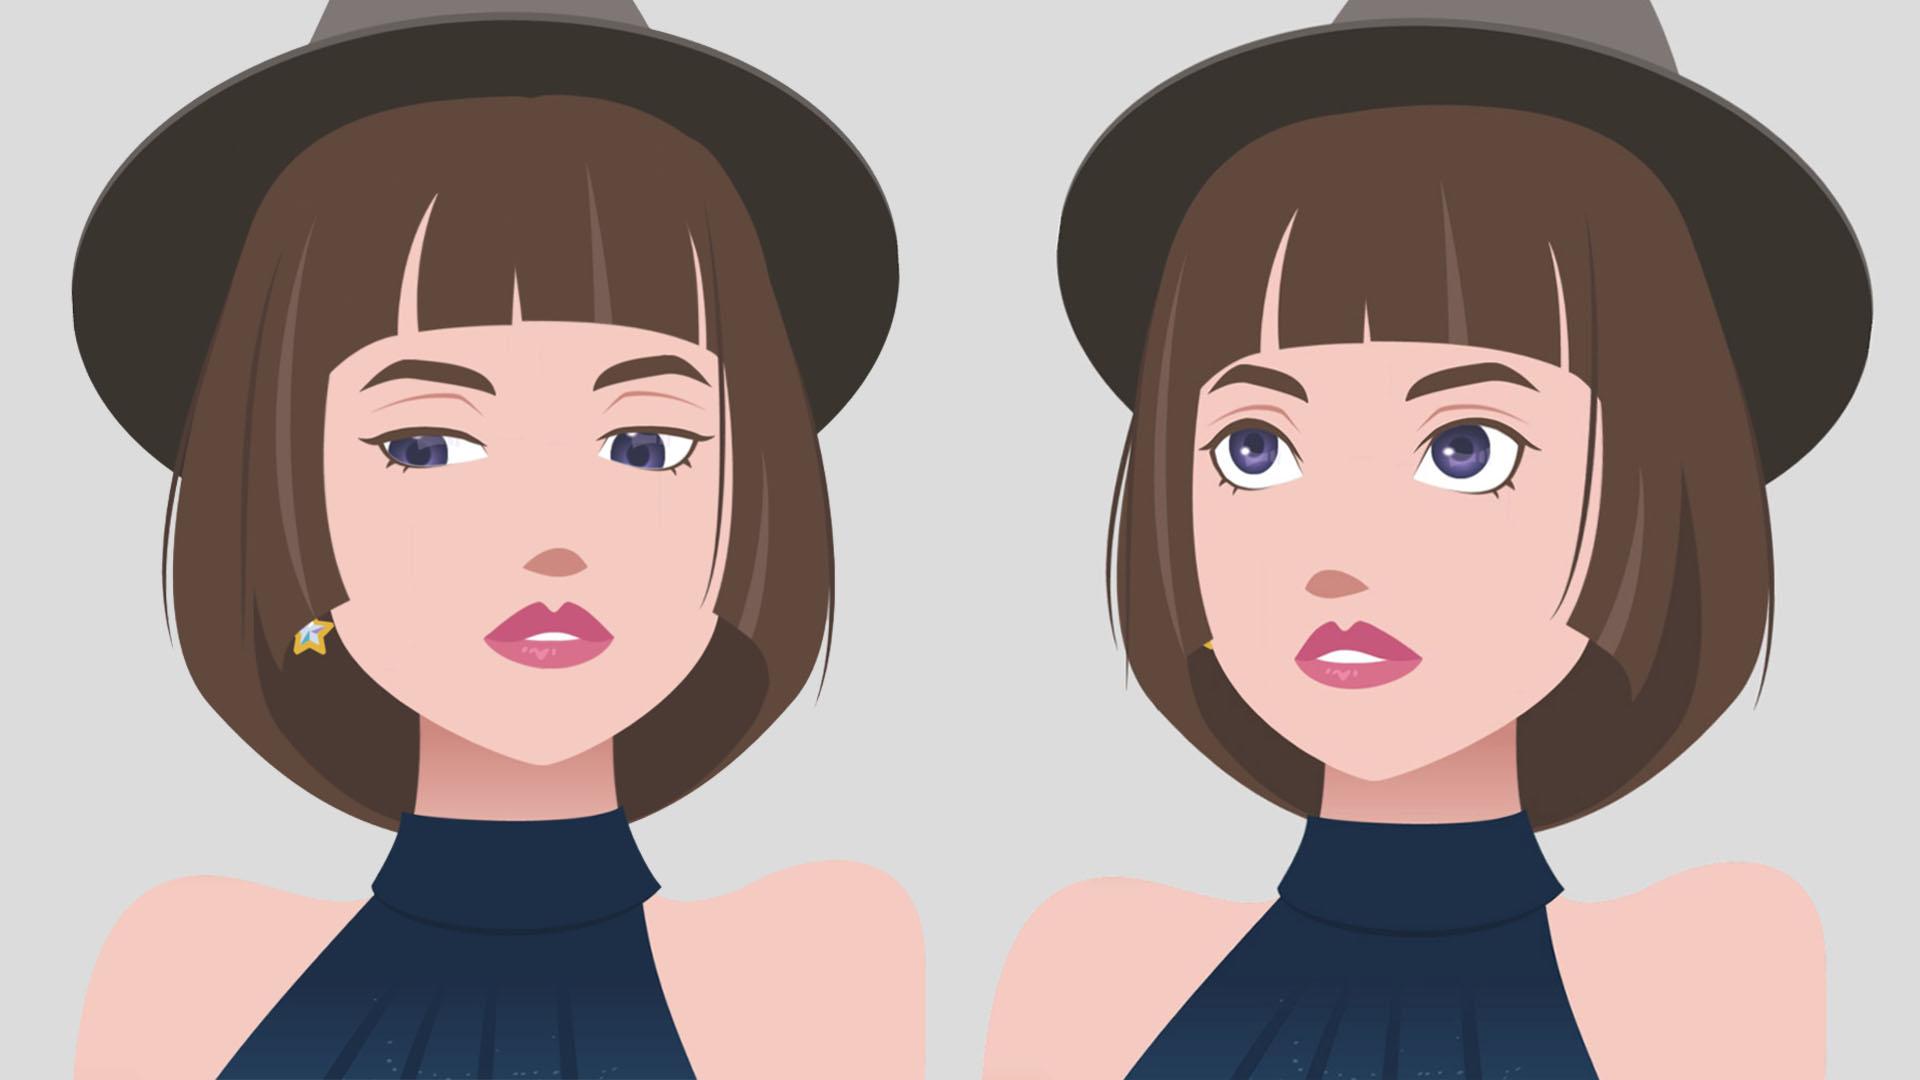 Cartoon Animator - Animated Character Design